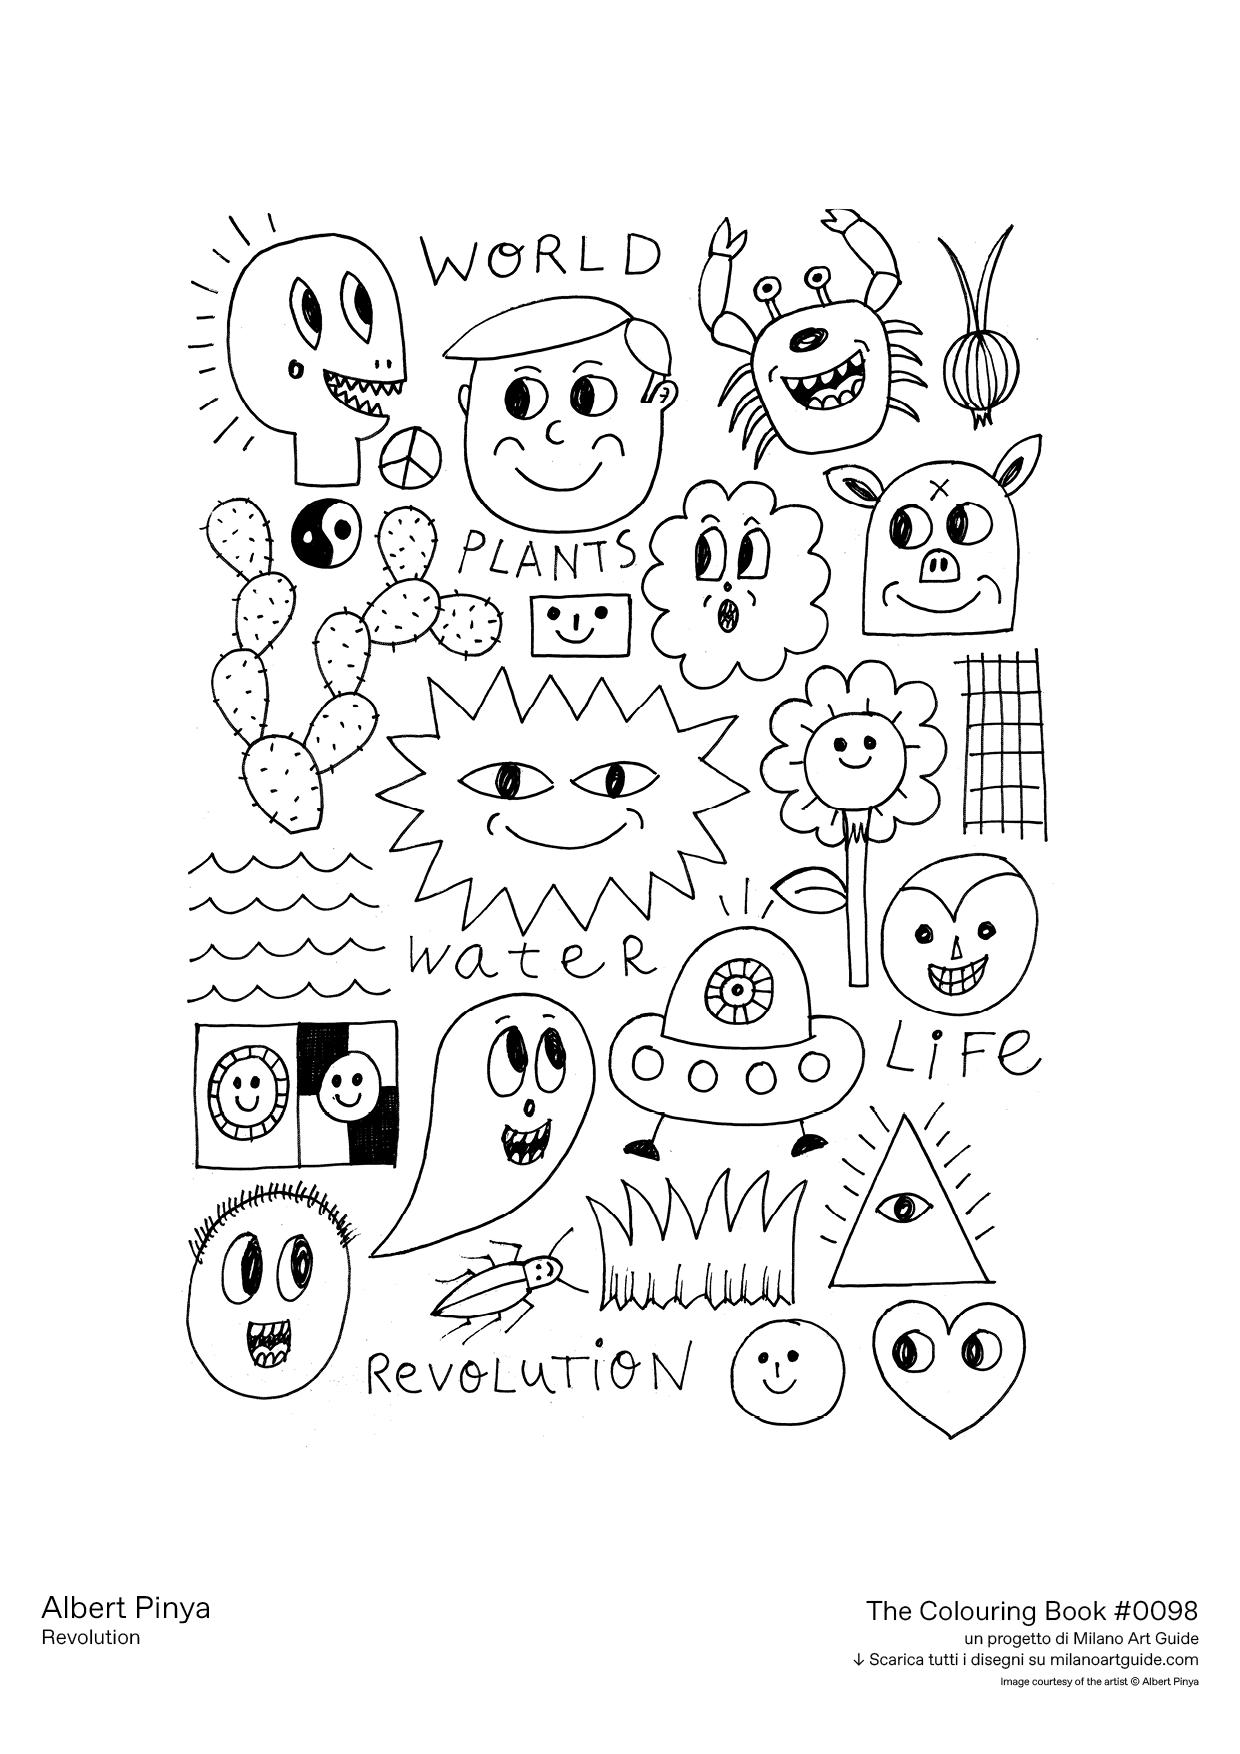 0098_AlbertPinya_Revolution_THECOLOURINGBOOK_MILANOARTGUIDE.png